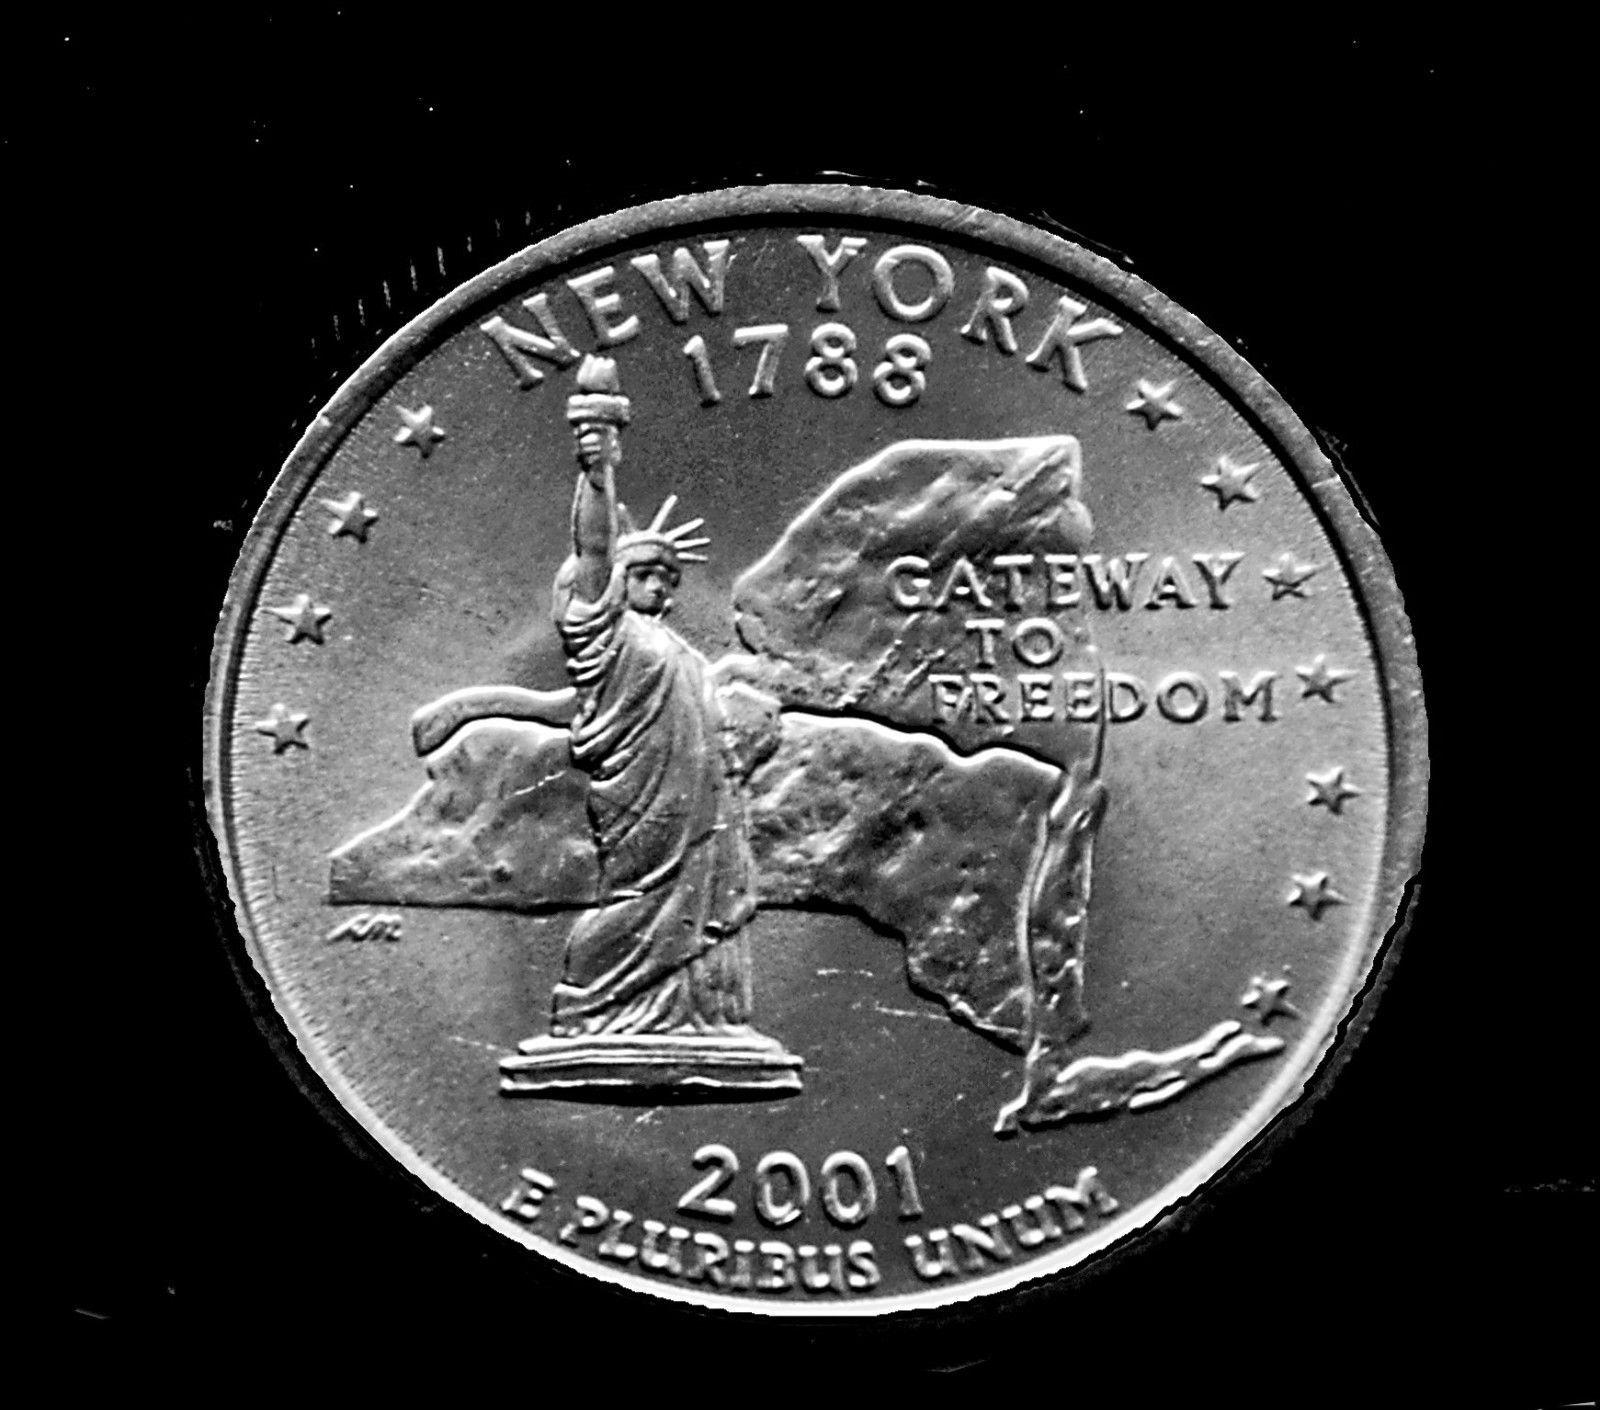 BU Louisiana Purchase State Quarter 2002 P U.S Philadelphia Mint Coin